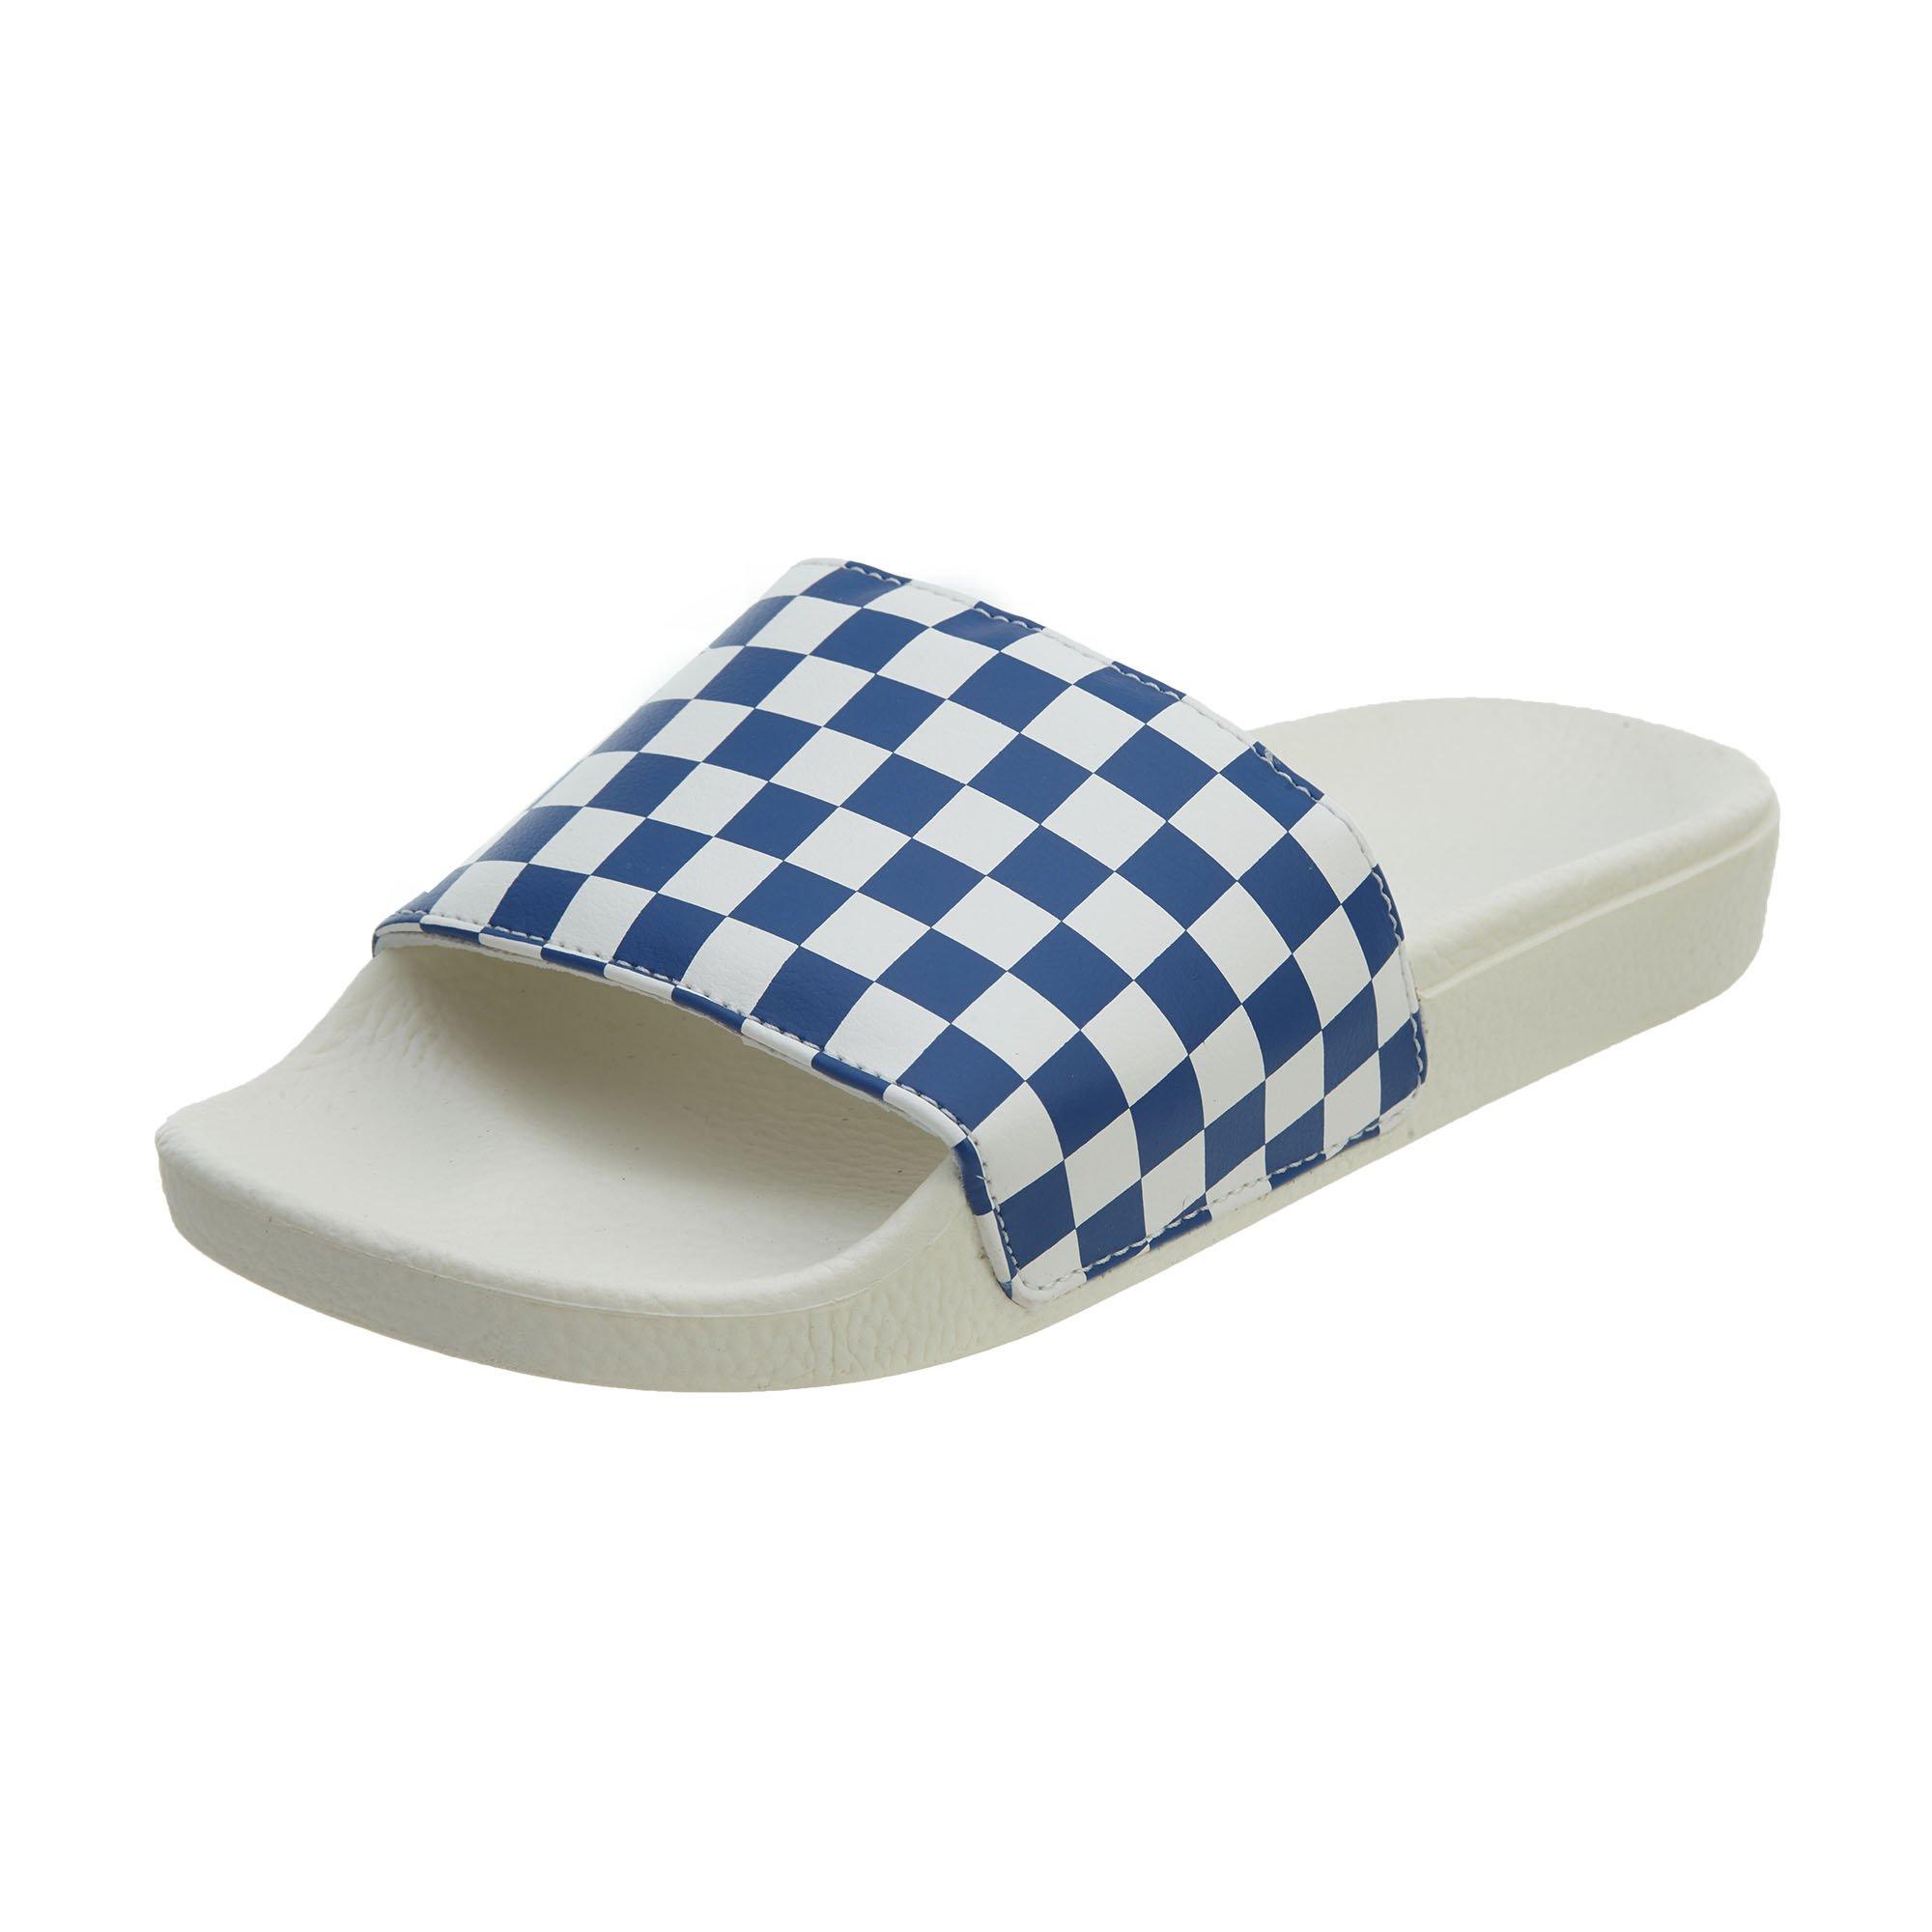 e1682c92c083 Galleon - Vans Checkerboard Slide-On True Blue VN0004KIFBV Mens 8